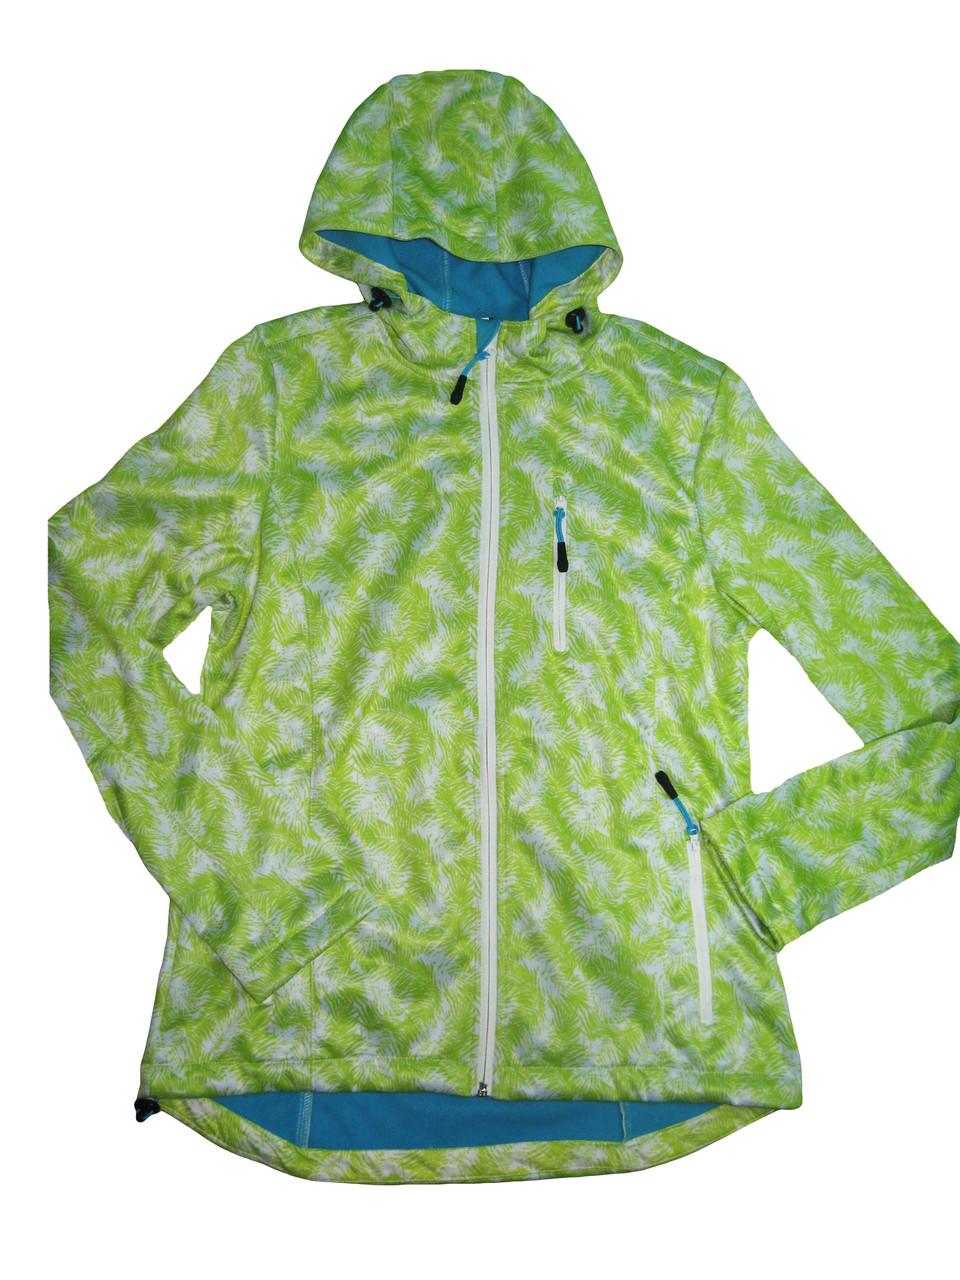 Куртка женская на флисе, CRIVIT, размер М, арт. Ж-162